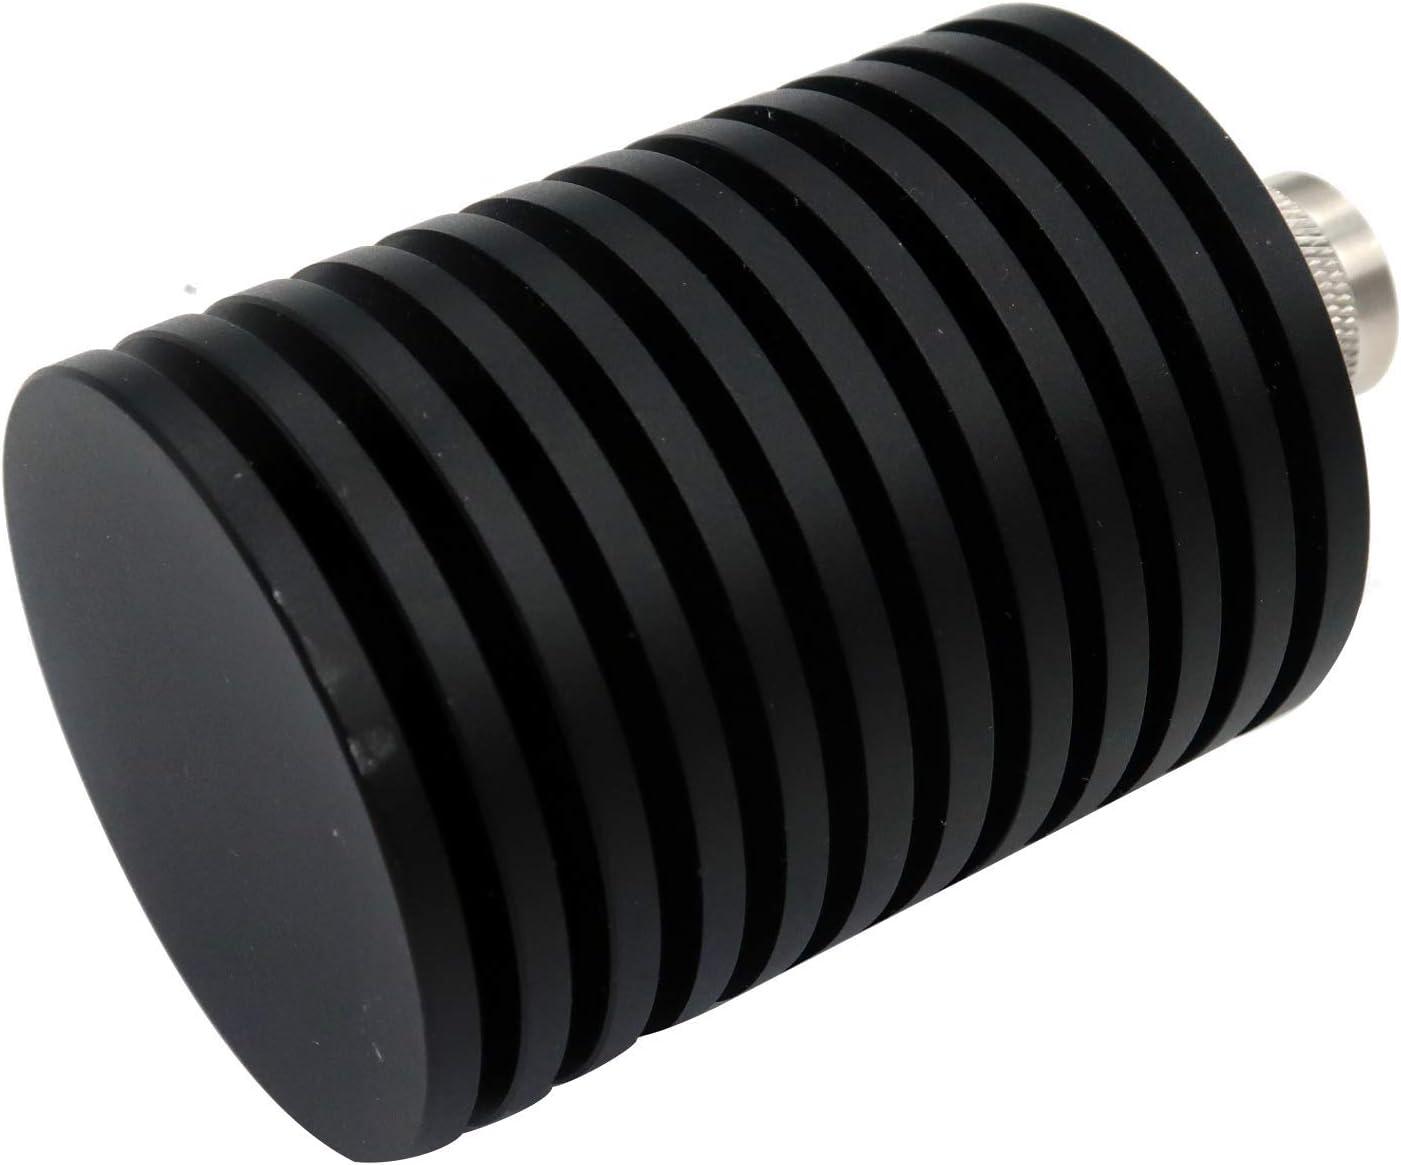 BECEN PL259 Male Plug Dummy Load DC to 1.0GHz 50 Ohm 100Watt